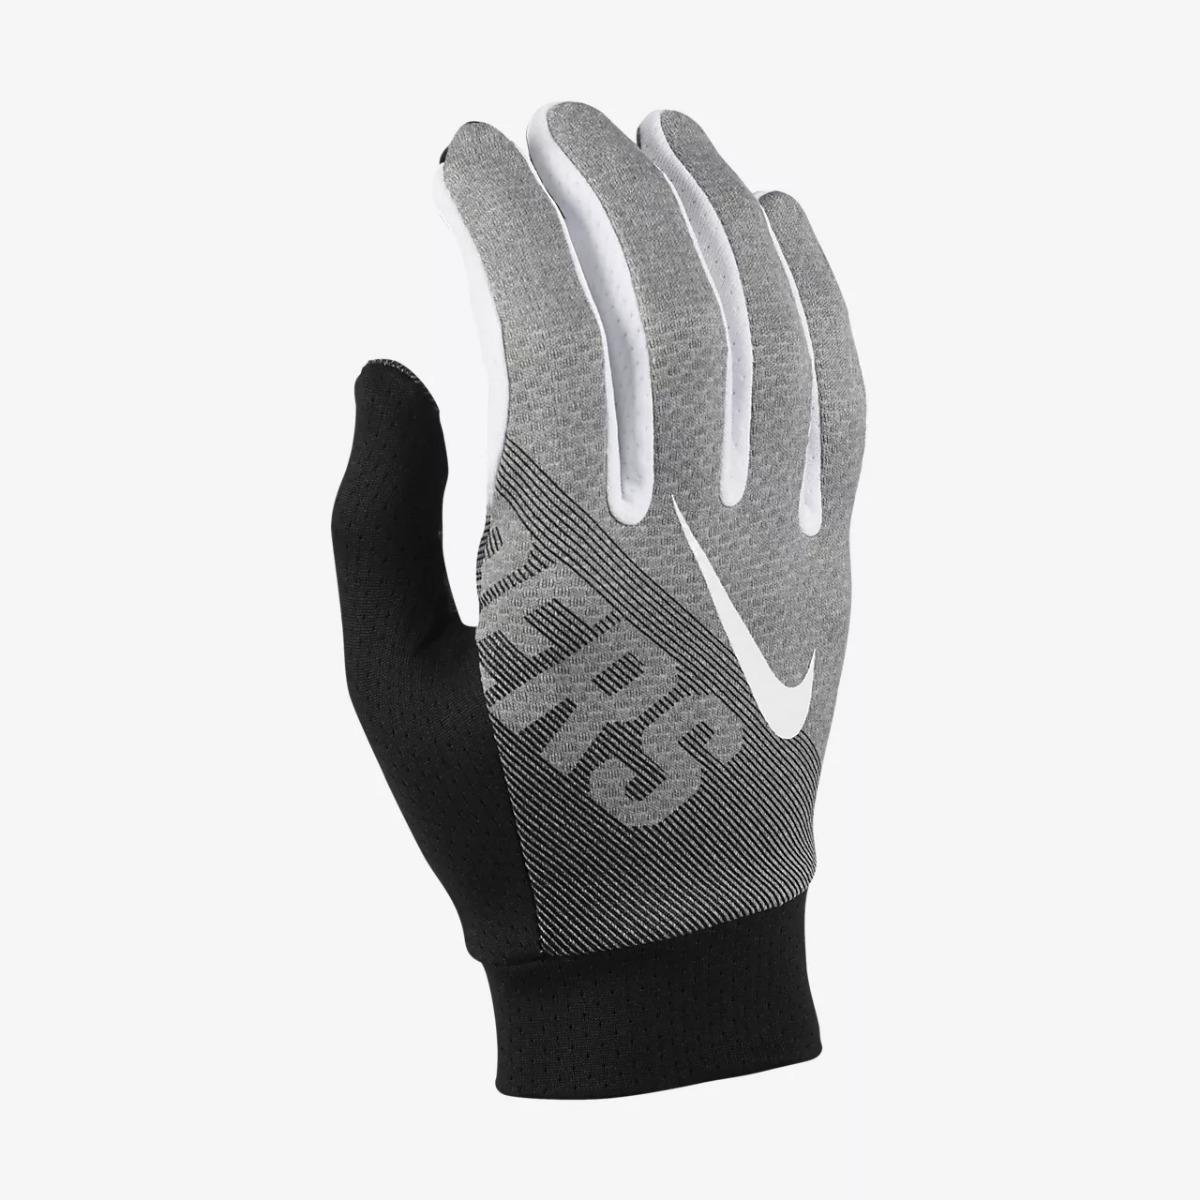 d434a760b556f nfl nike guantes oakland raiders adulto nike para el frio. Cargando zoom.